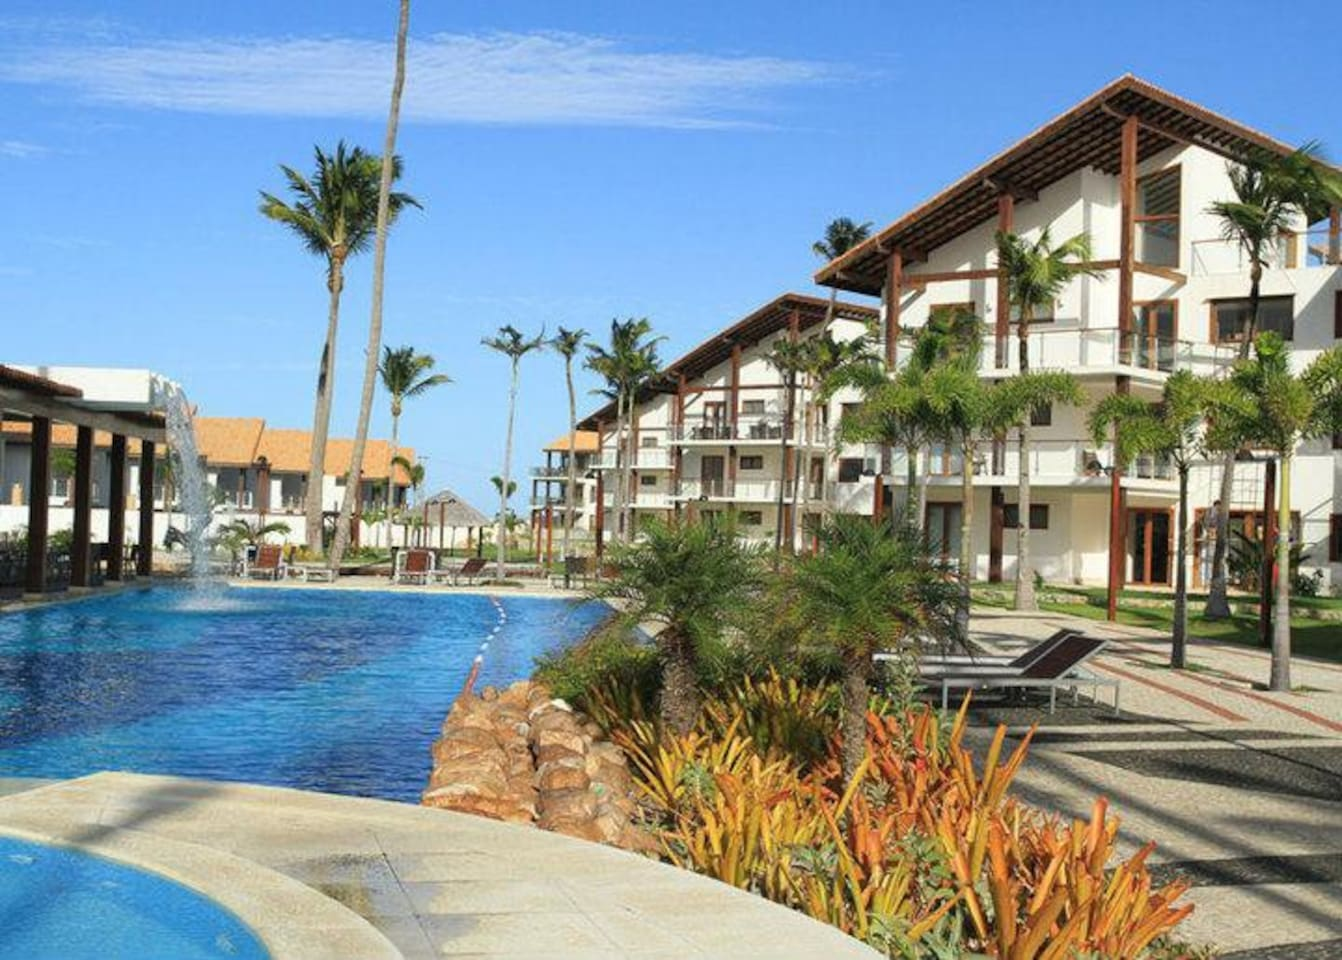 Taíba Beach Resort